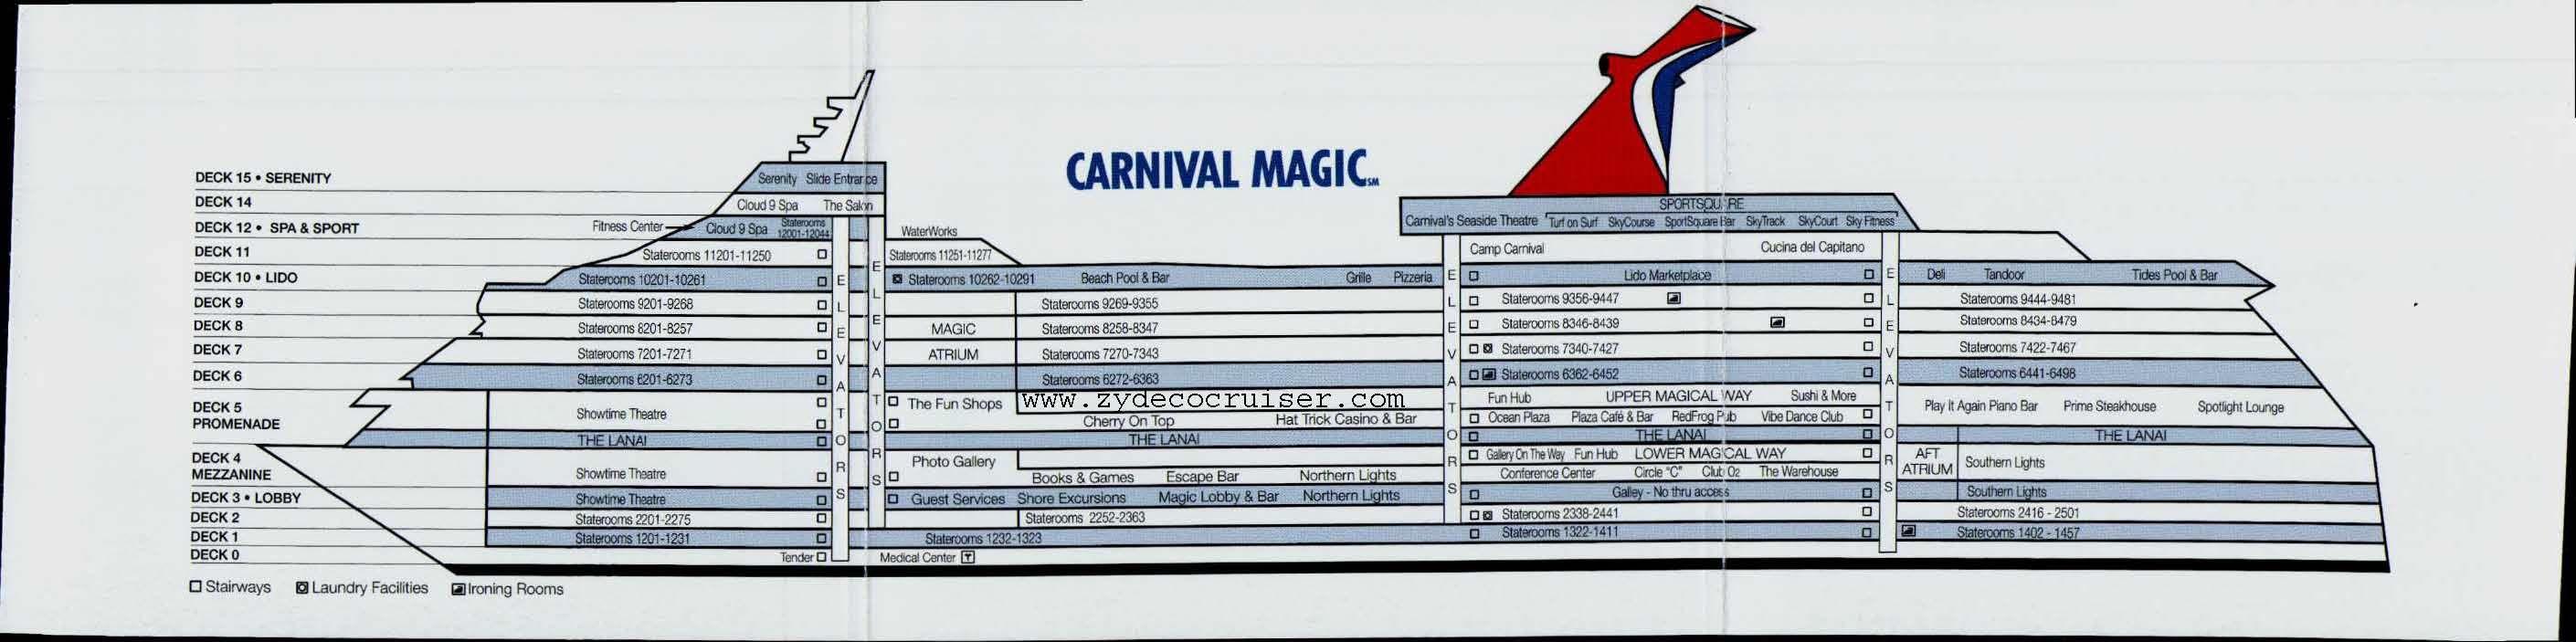 Decks on the carnival magic all things carnival pinterest decks on the carnival magic all things carnival pinterest deck plans cruises and cruise ships baanklon Choice Image